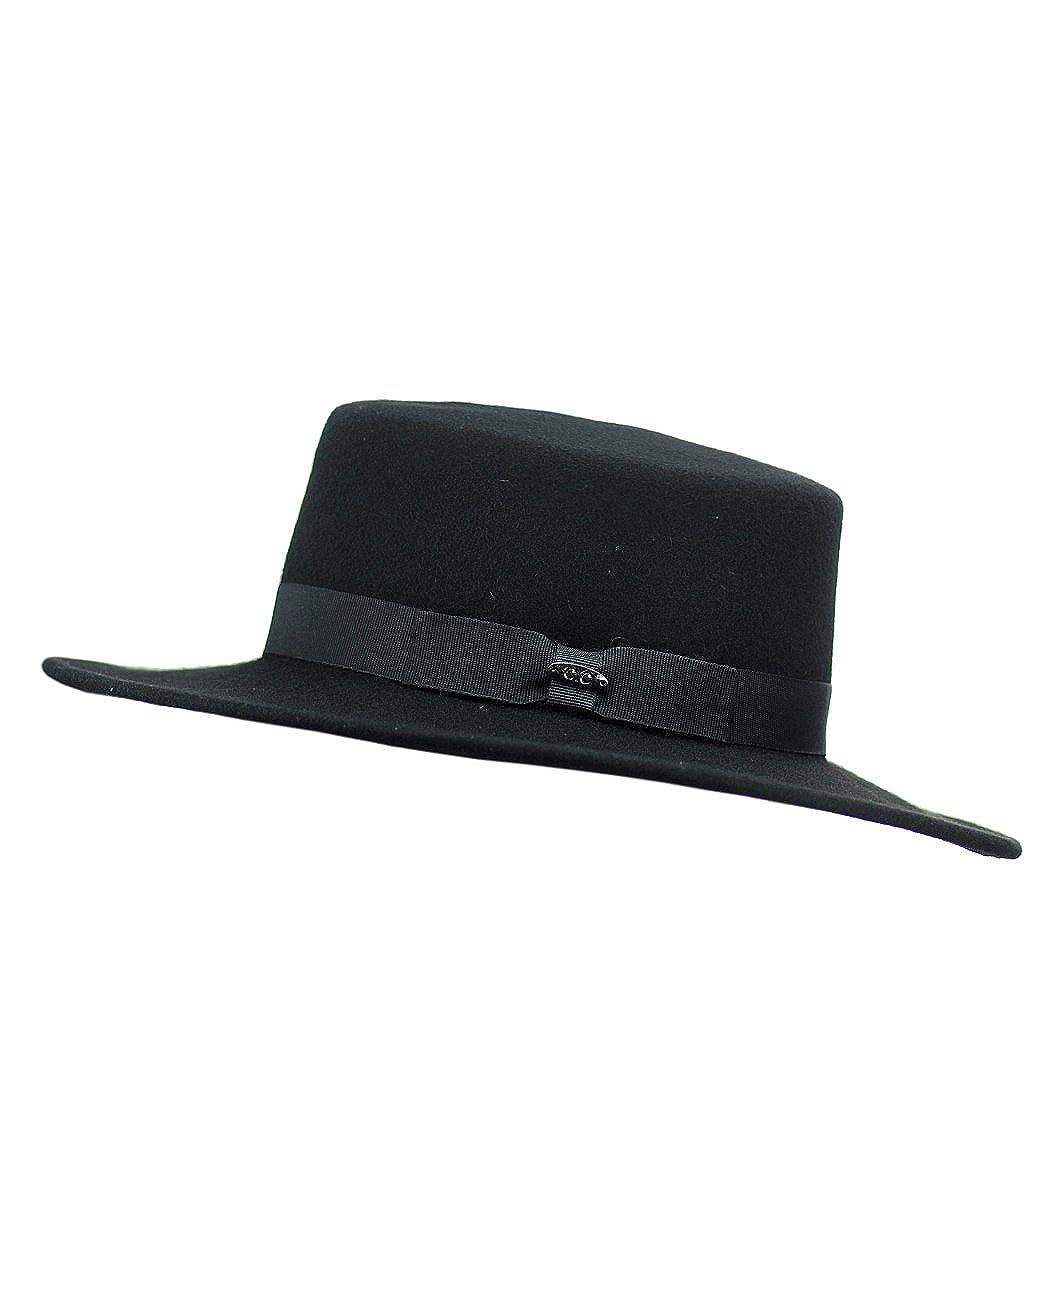 cafc300622d748 NYFASHION101 Wool Wide Brim Porkpie Fedora Hat w/Simple Band Accent - Black  at Amazon Women's Clothing store: